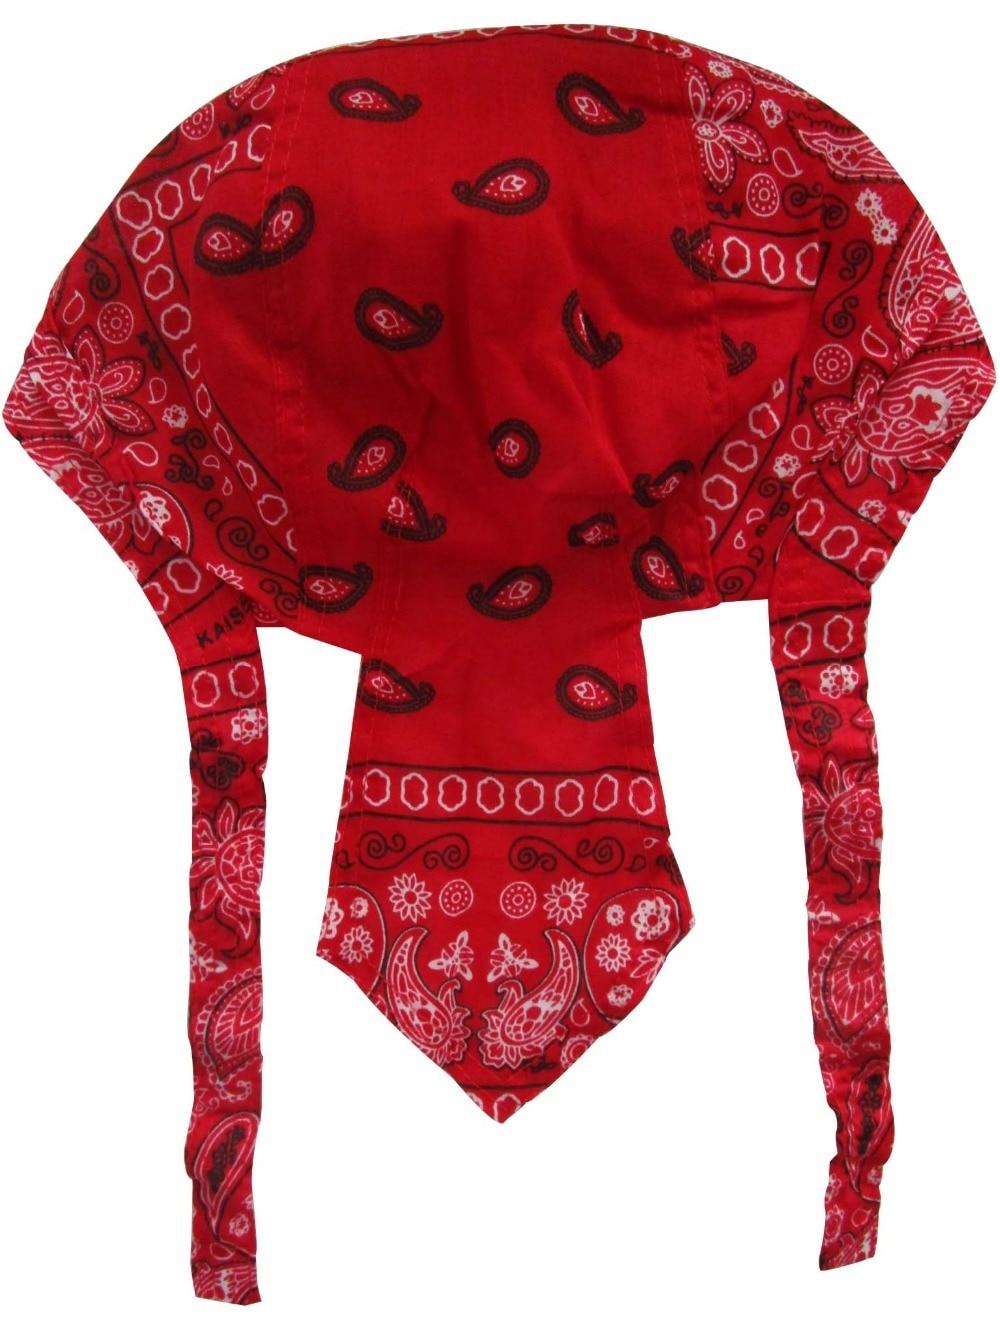 2018 New Men Black Red Paisley Durag Bandanna Du Rag Scarf Head Rap Tie  Down Band Biker Cap-in Skullies   Beanies from Apparel Accessories on  Aliexpress.com ... 2918ee1c499a